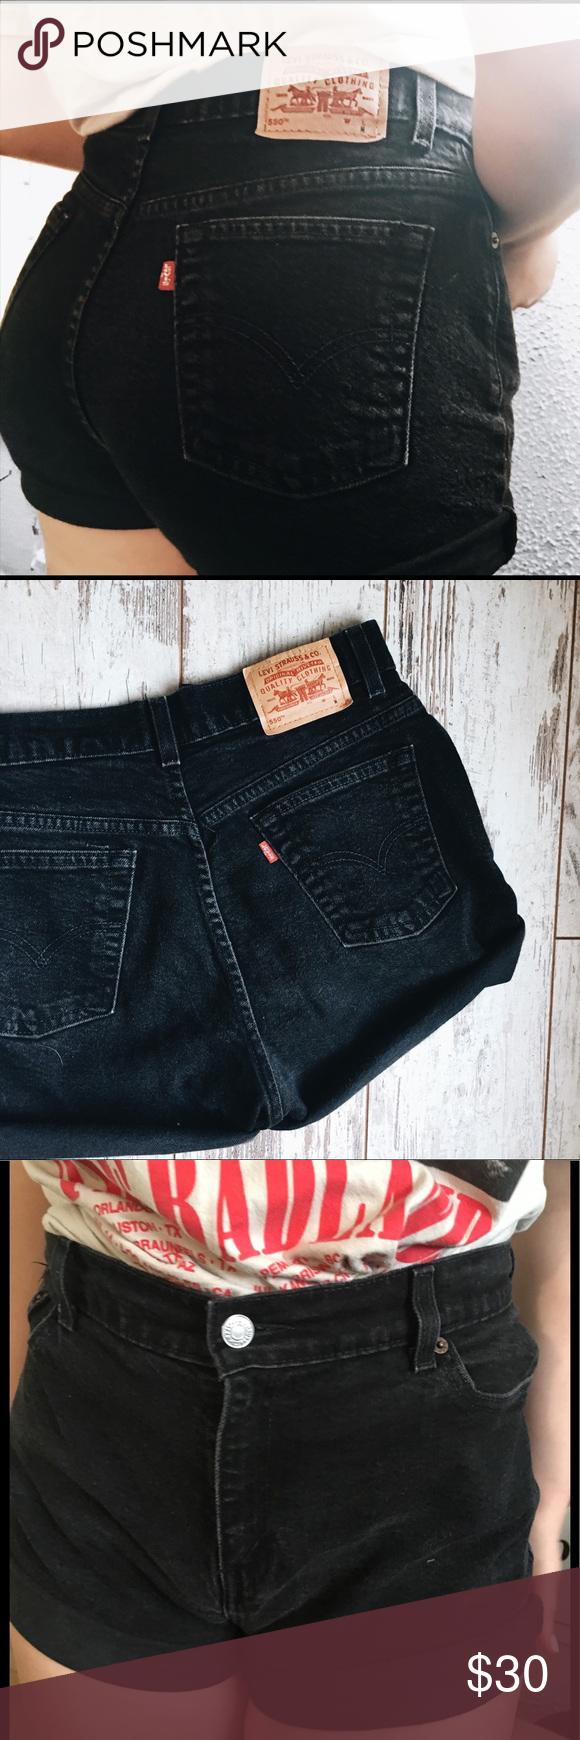 d270ad9f 🌹SALE ENDS TONIGHT LEVI BLACK HIGH WAISTED SHORTS Size 12 pet women's  Levi's Shorts Jean Shorts